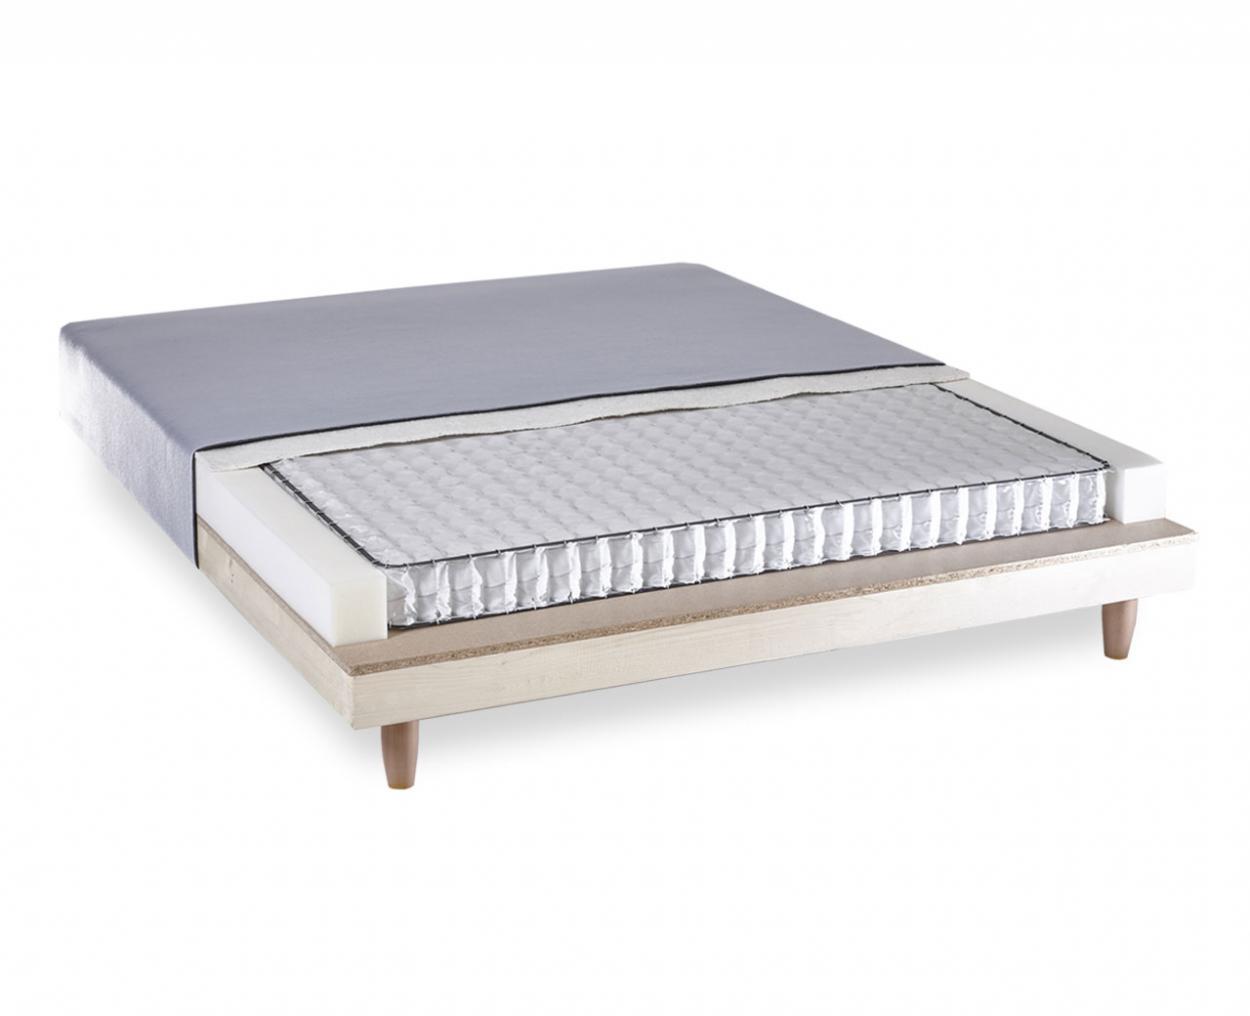 CandiaStrom - Βάση Pocket Bed Base 1